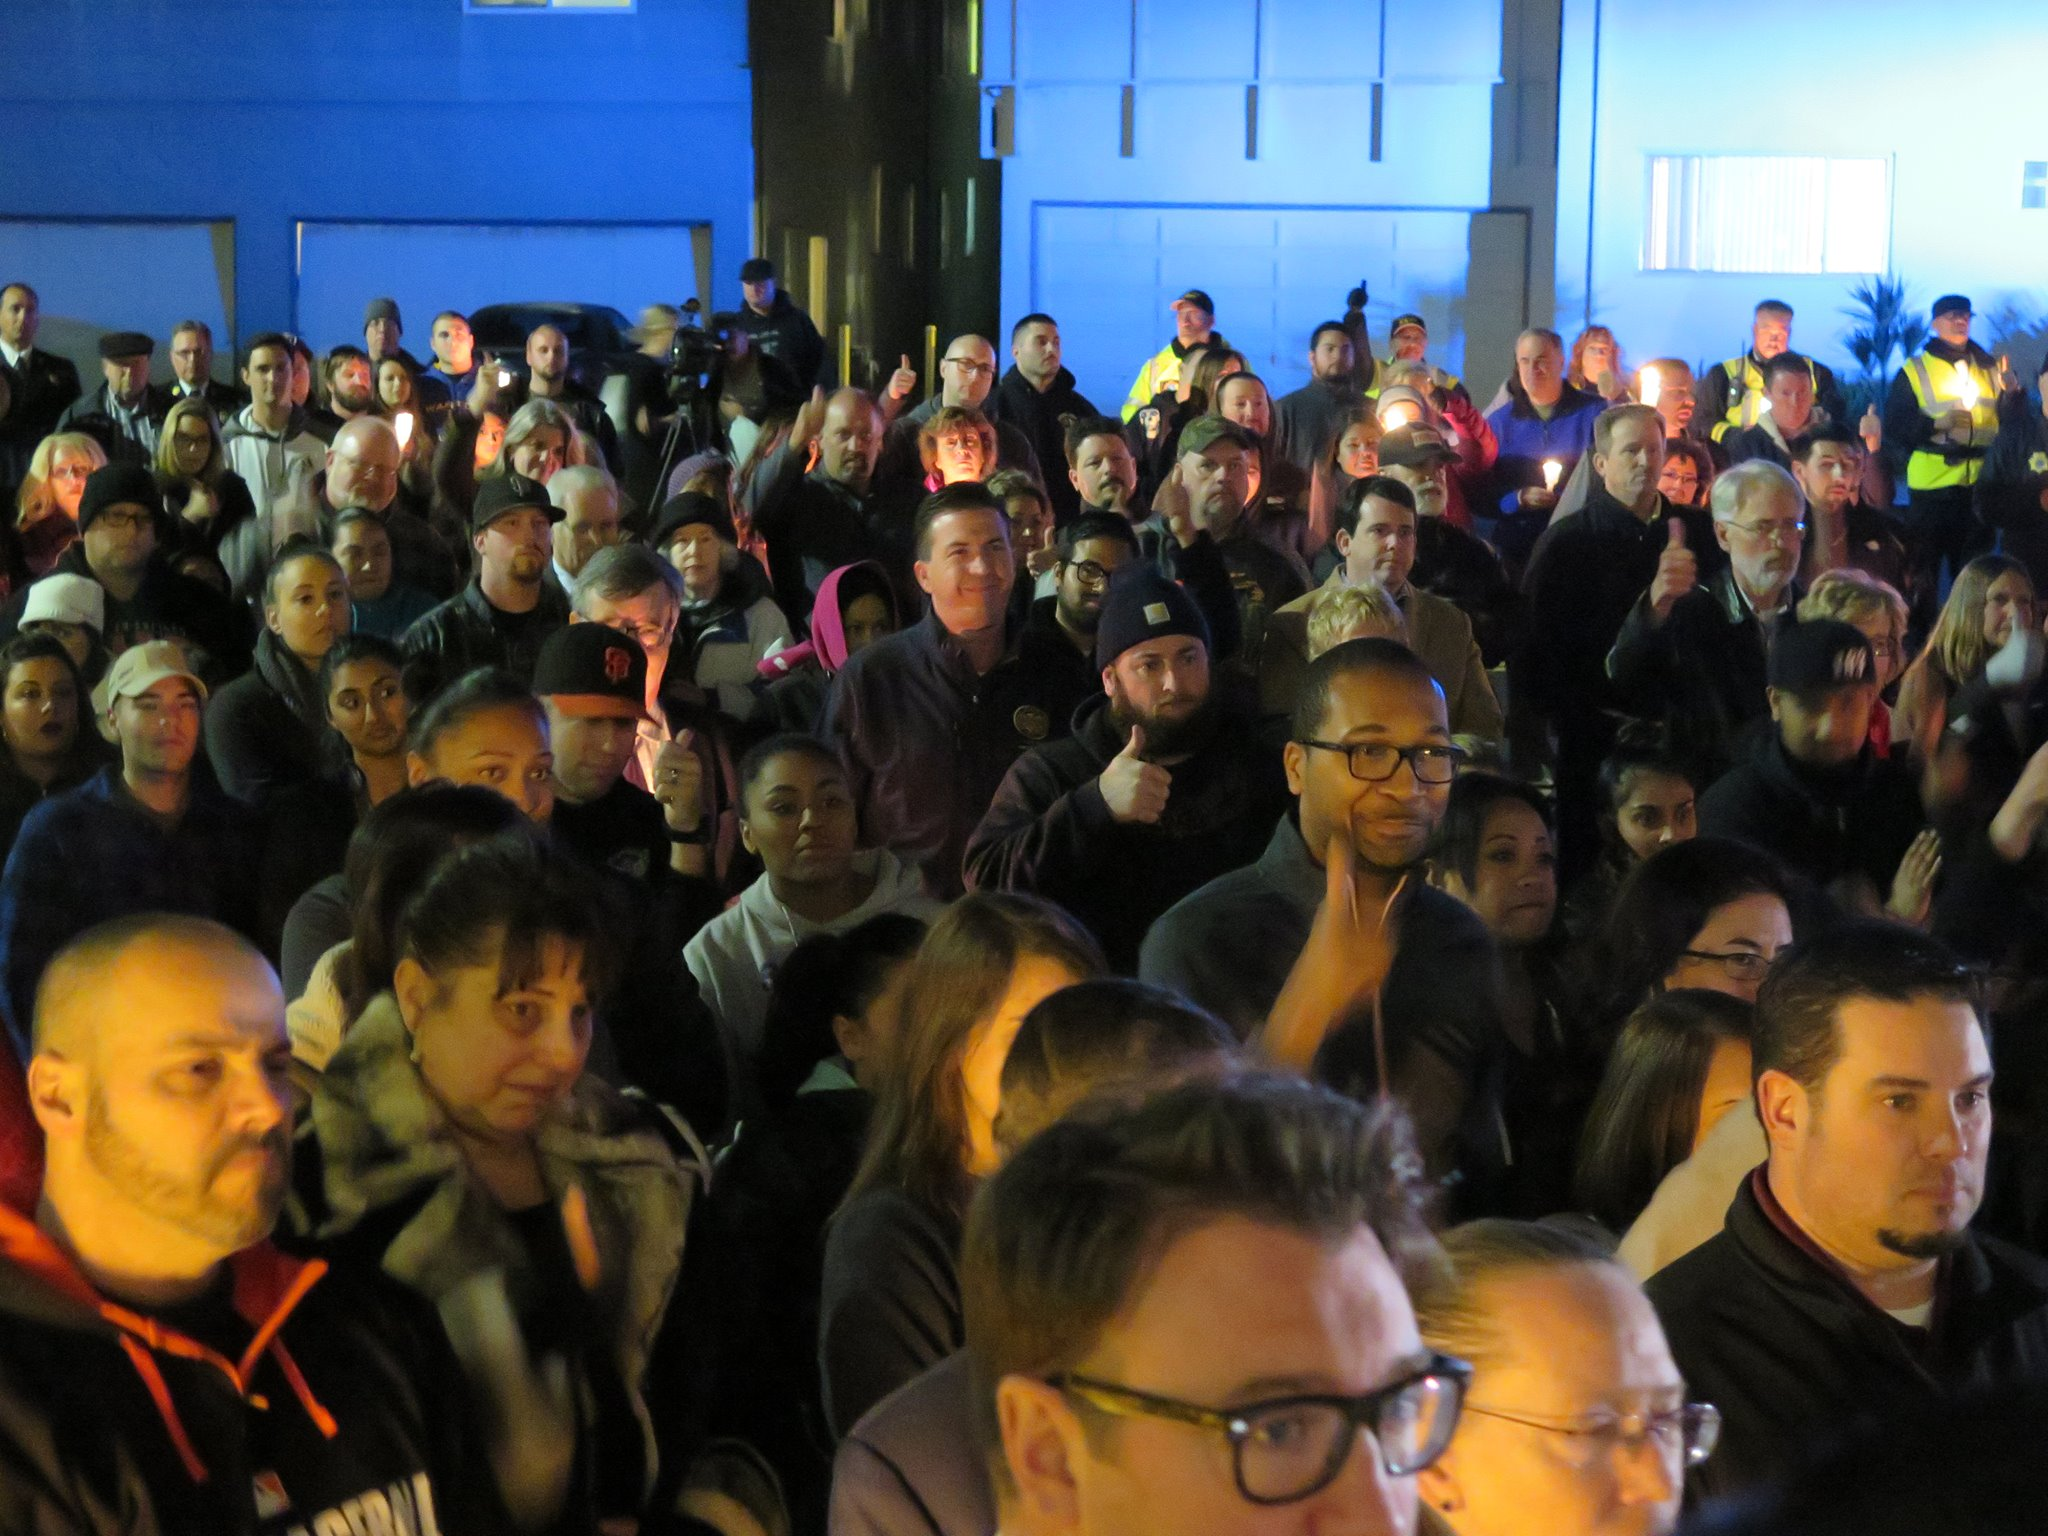 esc-vigil-crowd-3-thumbup